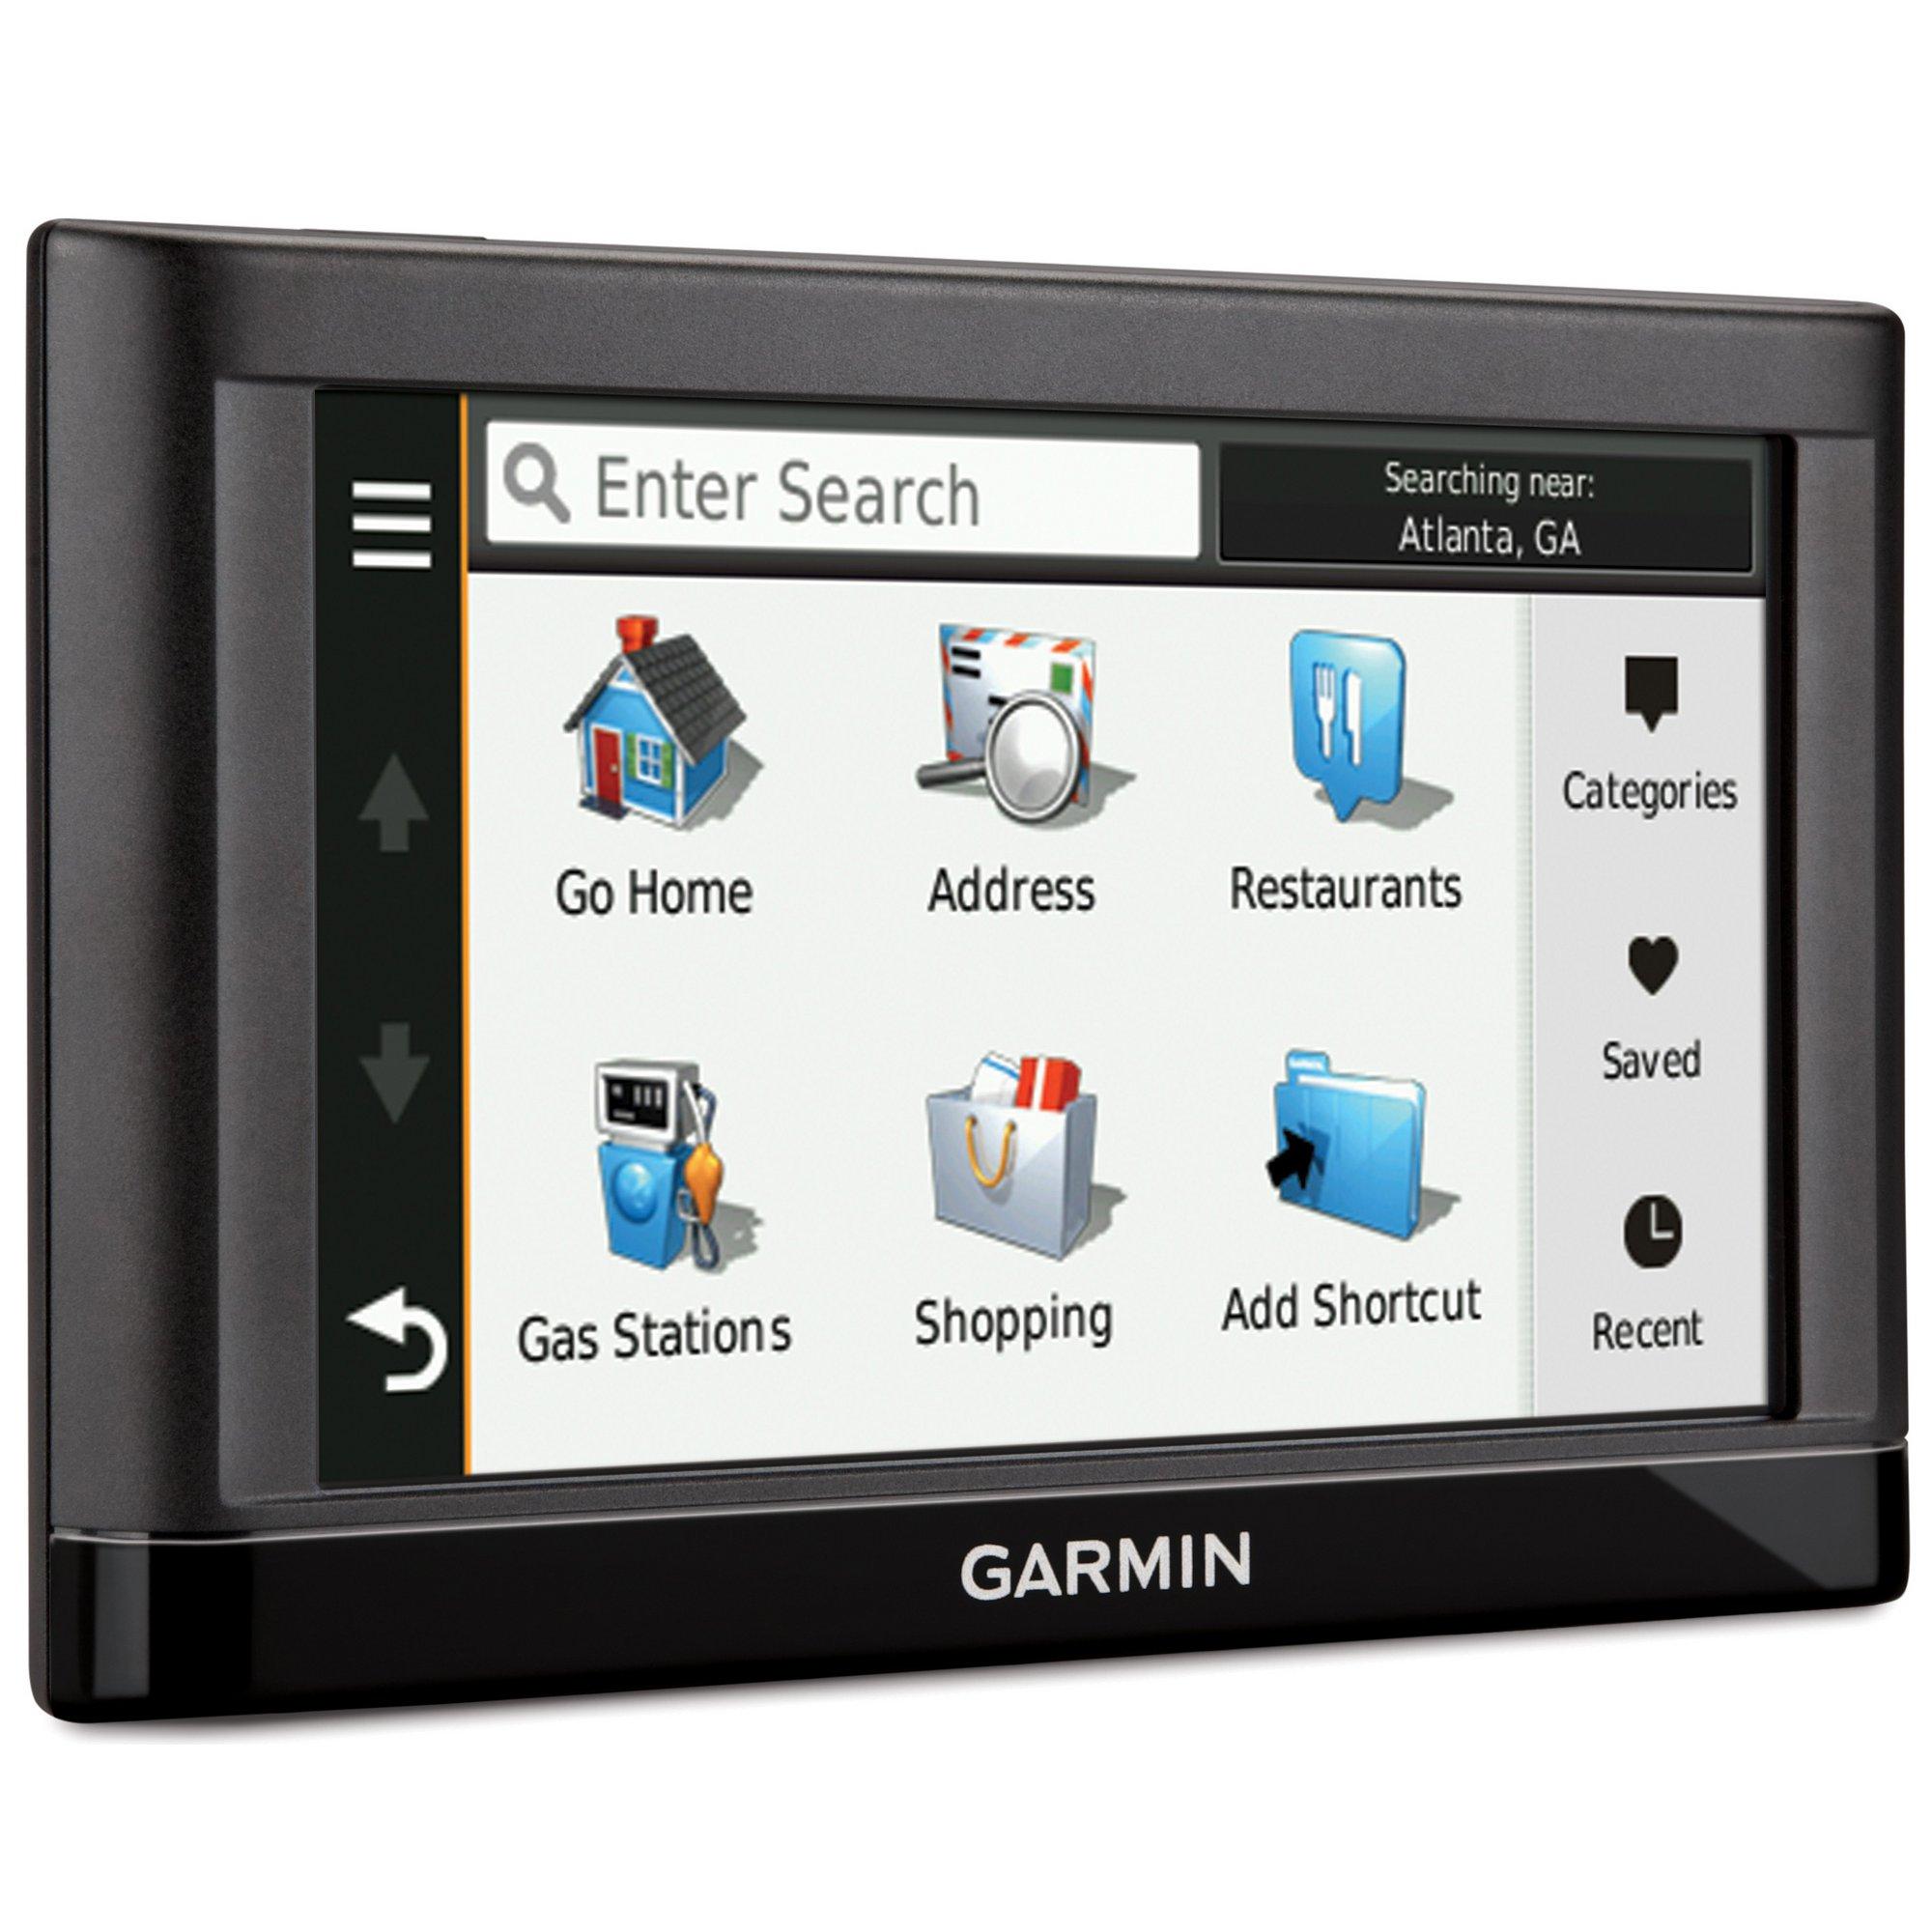 Garmin Nuvi LM GPS FREE LIFETIME UK Western Europe Maps - Free us map for garmin nuvi 55